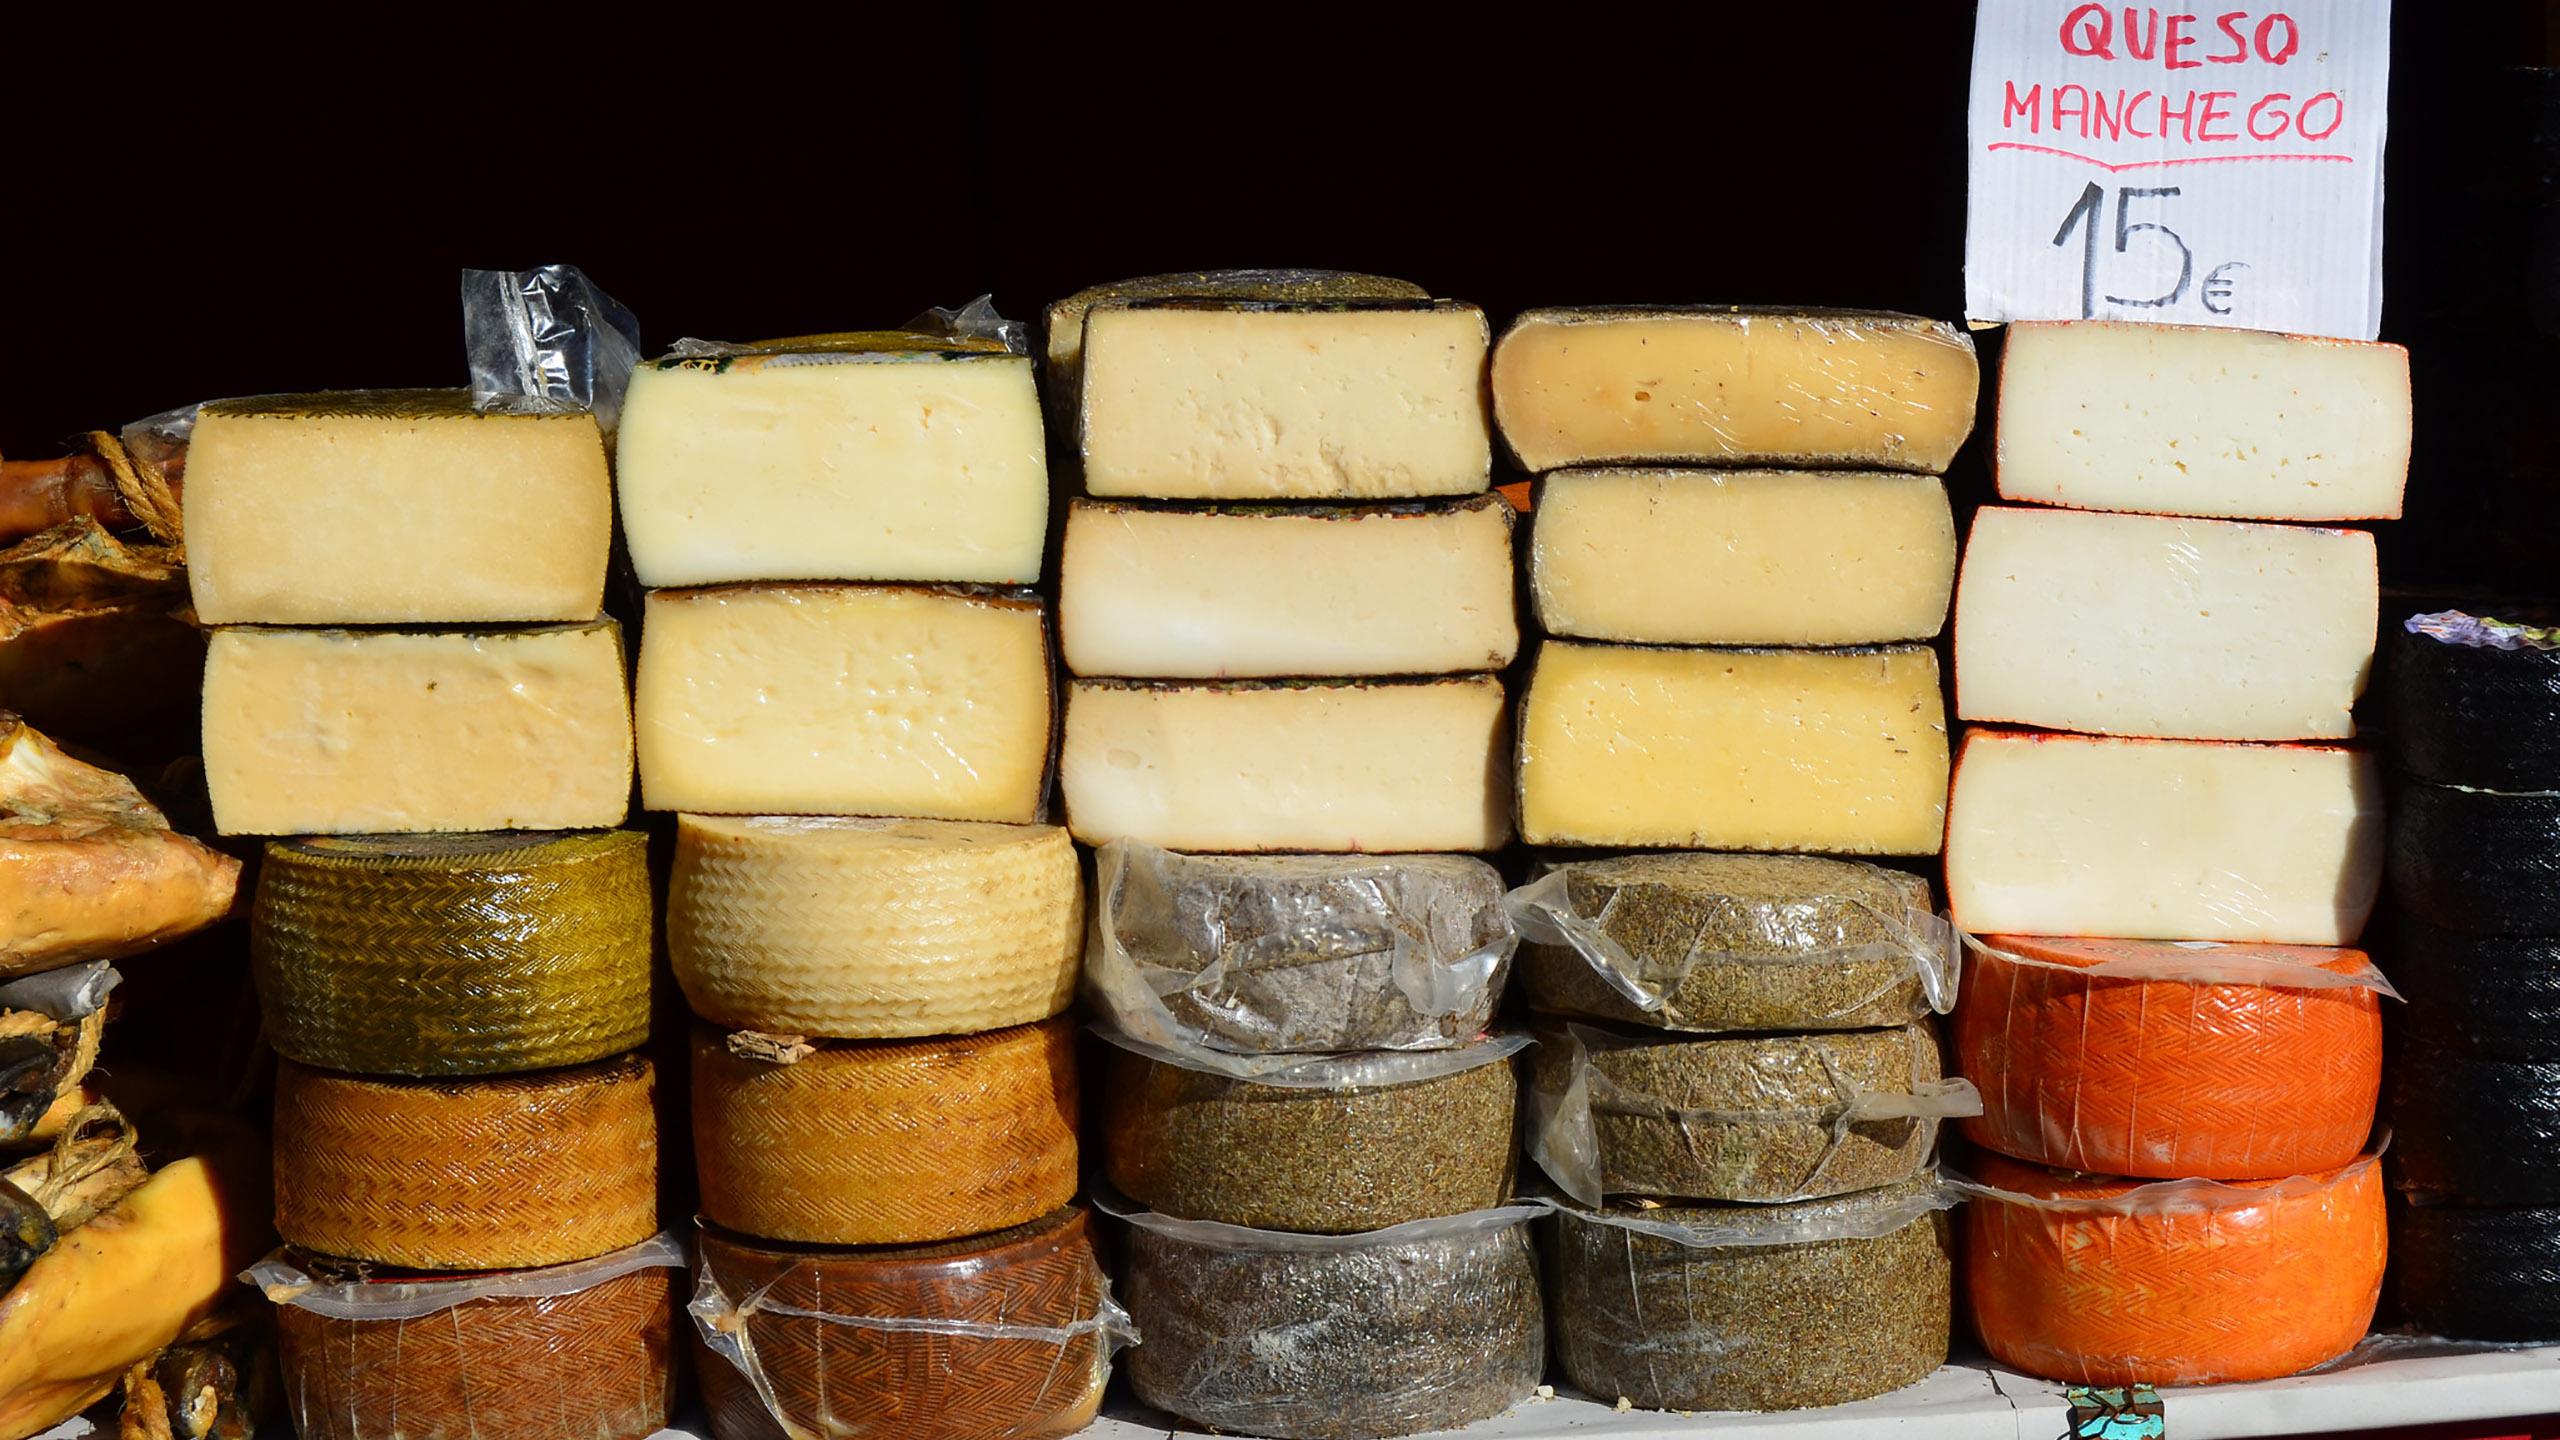 queso manchego, queso imitación, queso gouda, queso parmesano, queso tipo, sabor a queso